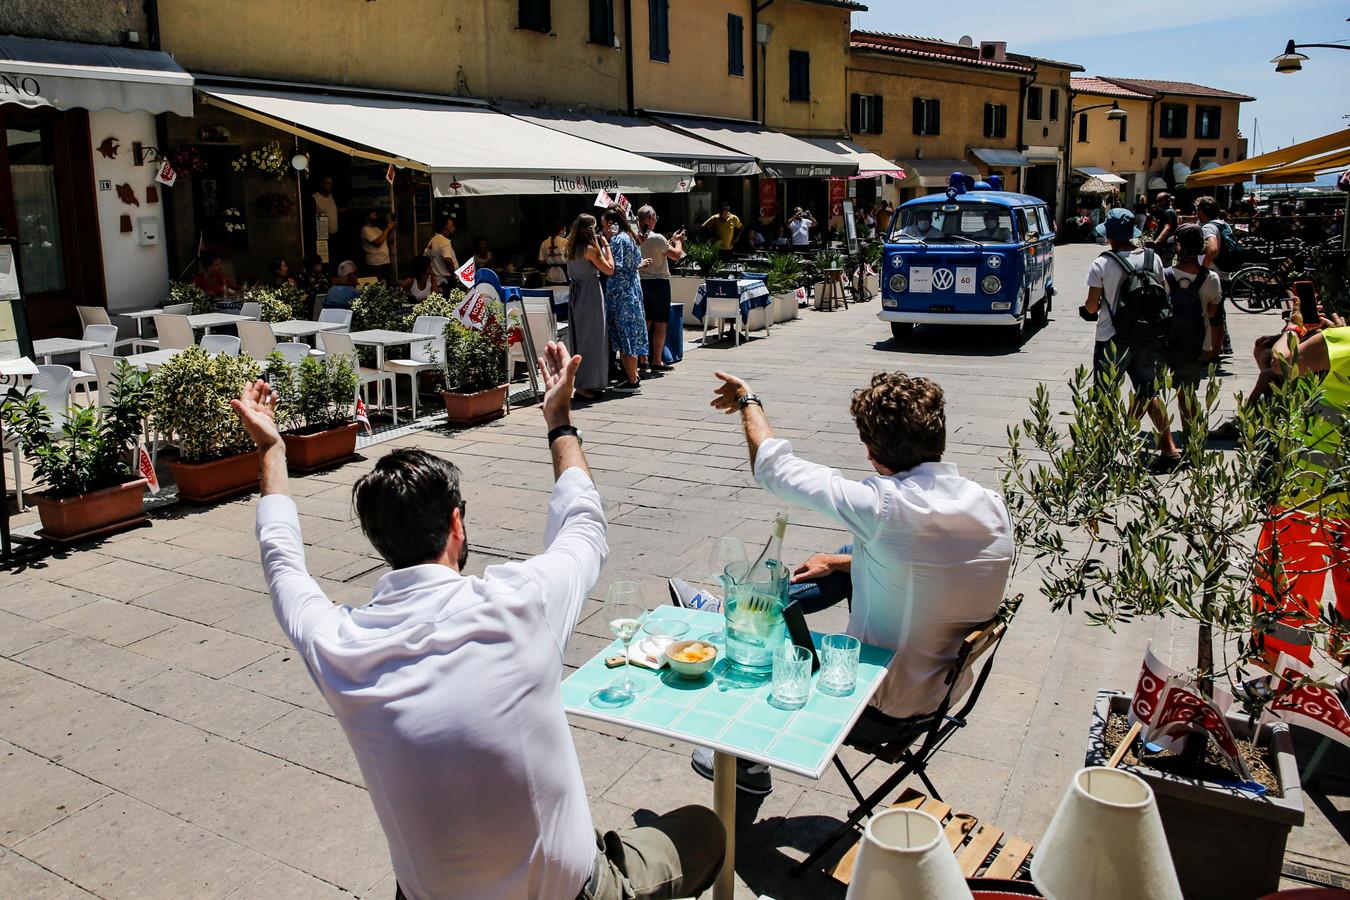 Een warm welkom in Castiglione della Pescaia, bij Grosseto, Toscane.